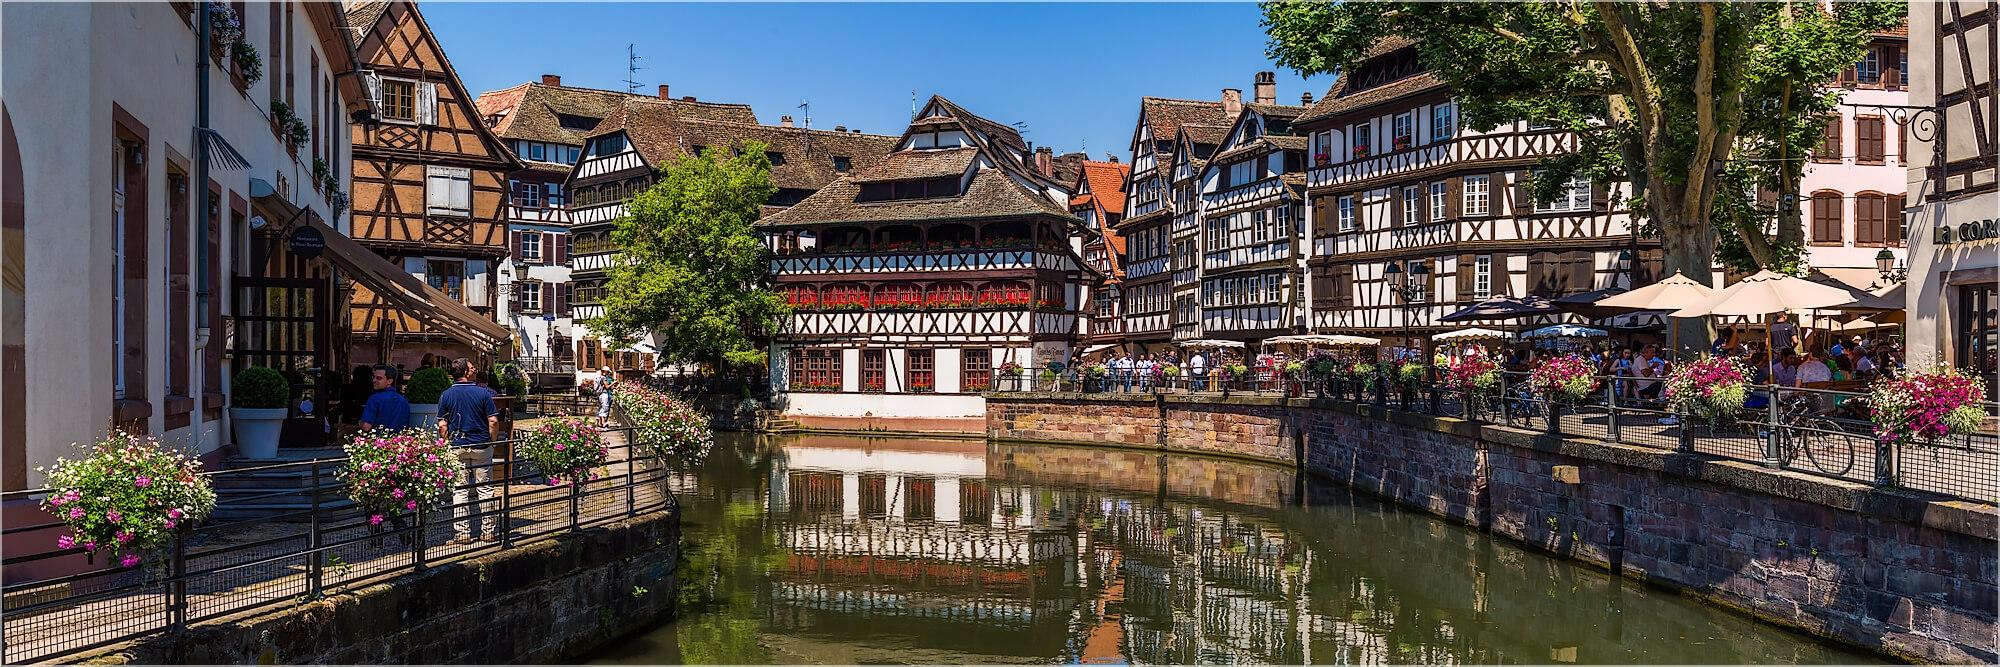 Panoramabild Straßburg Fachwerkhäuser Petit France